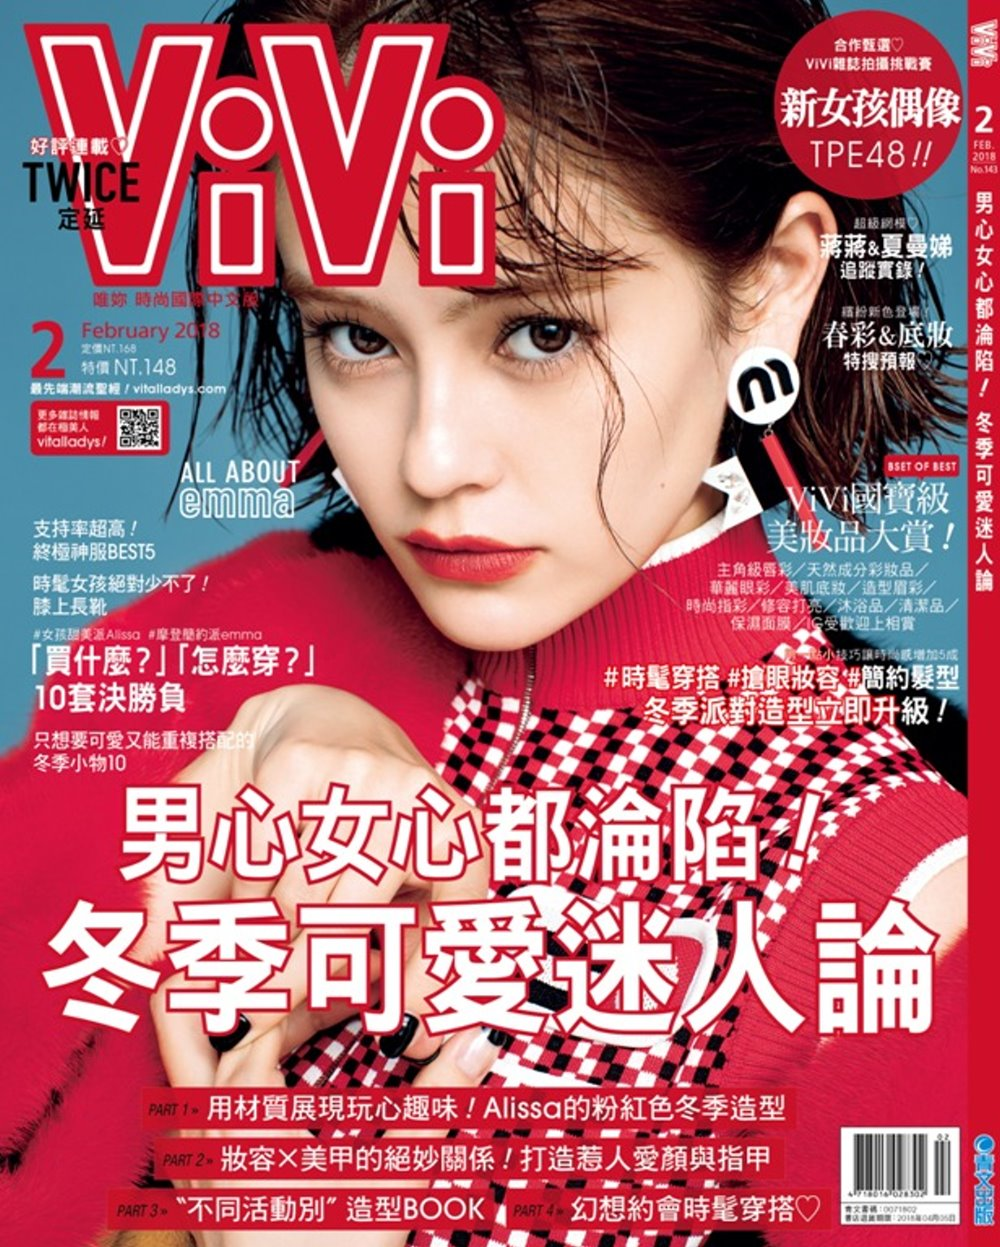 ViVi唯妳時尚國際中文版 2月號/2018 第143期